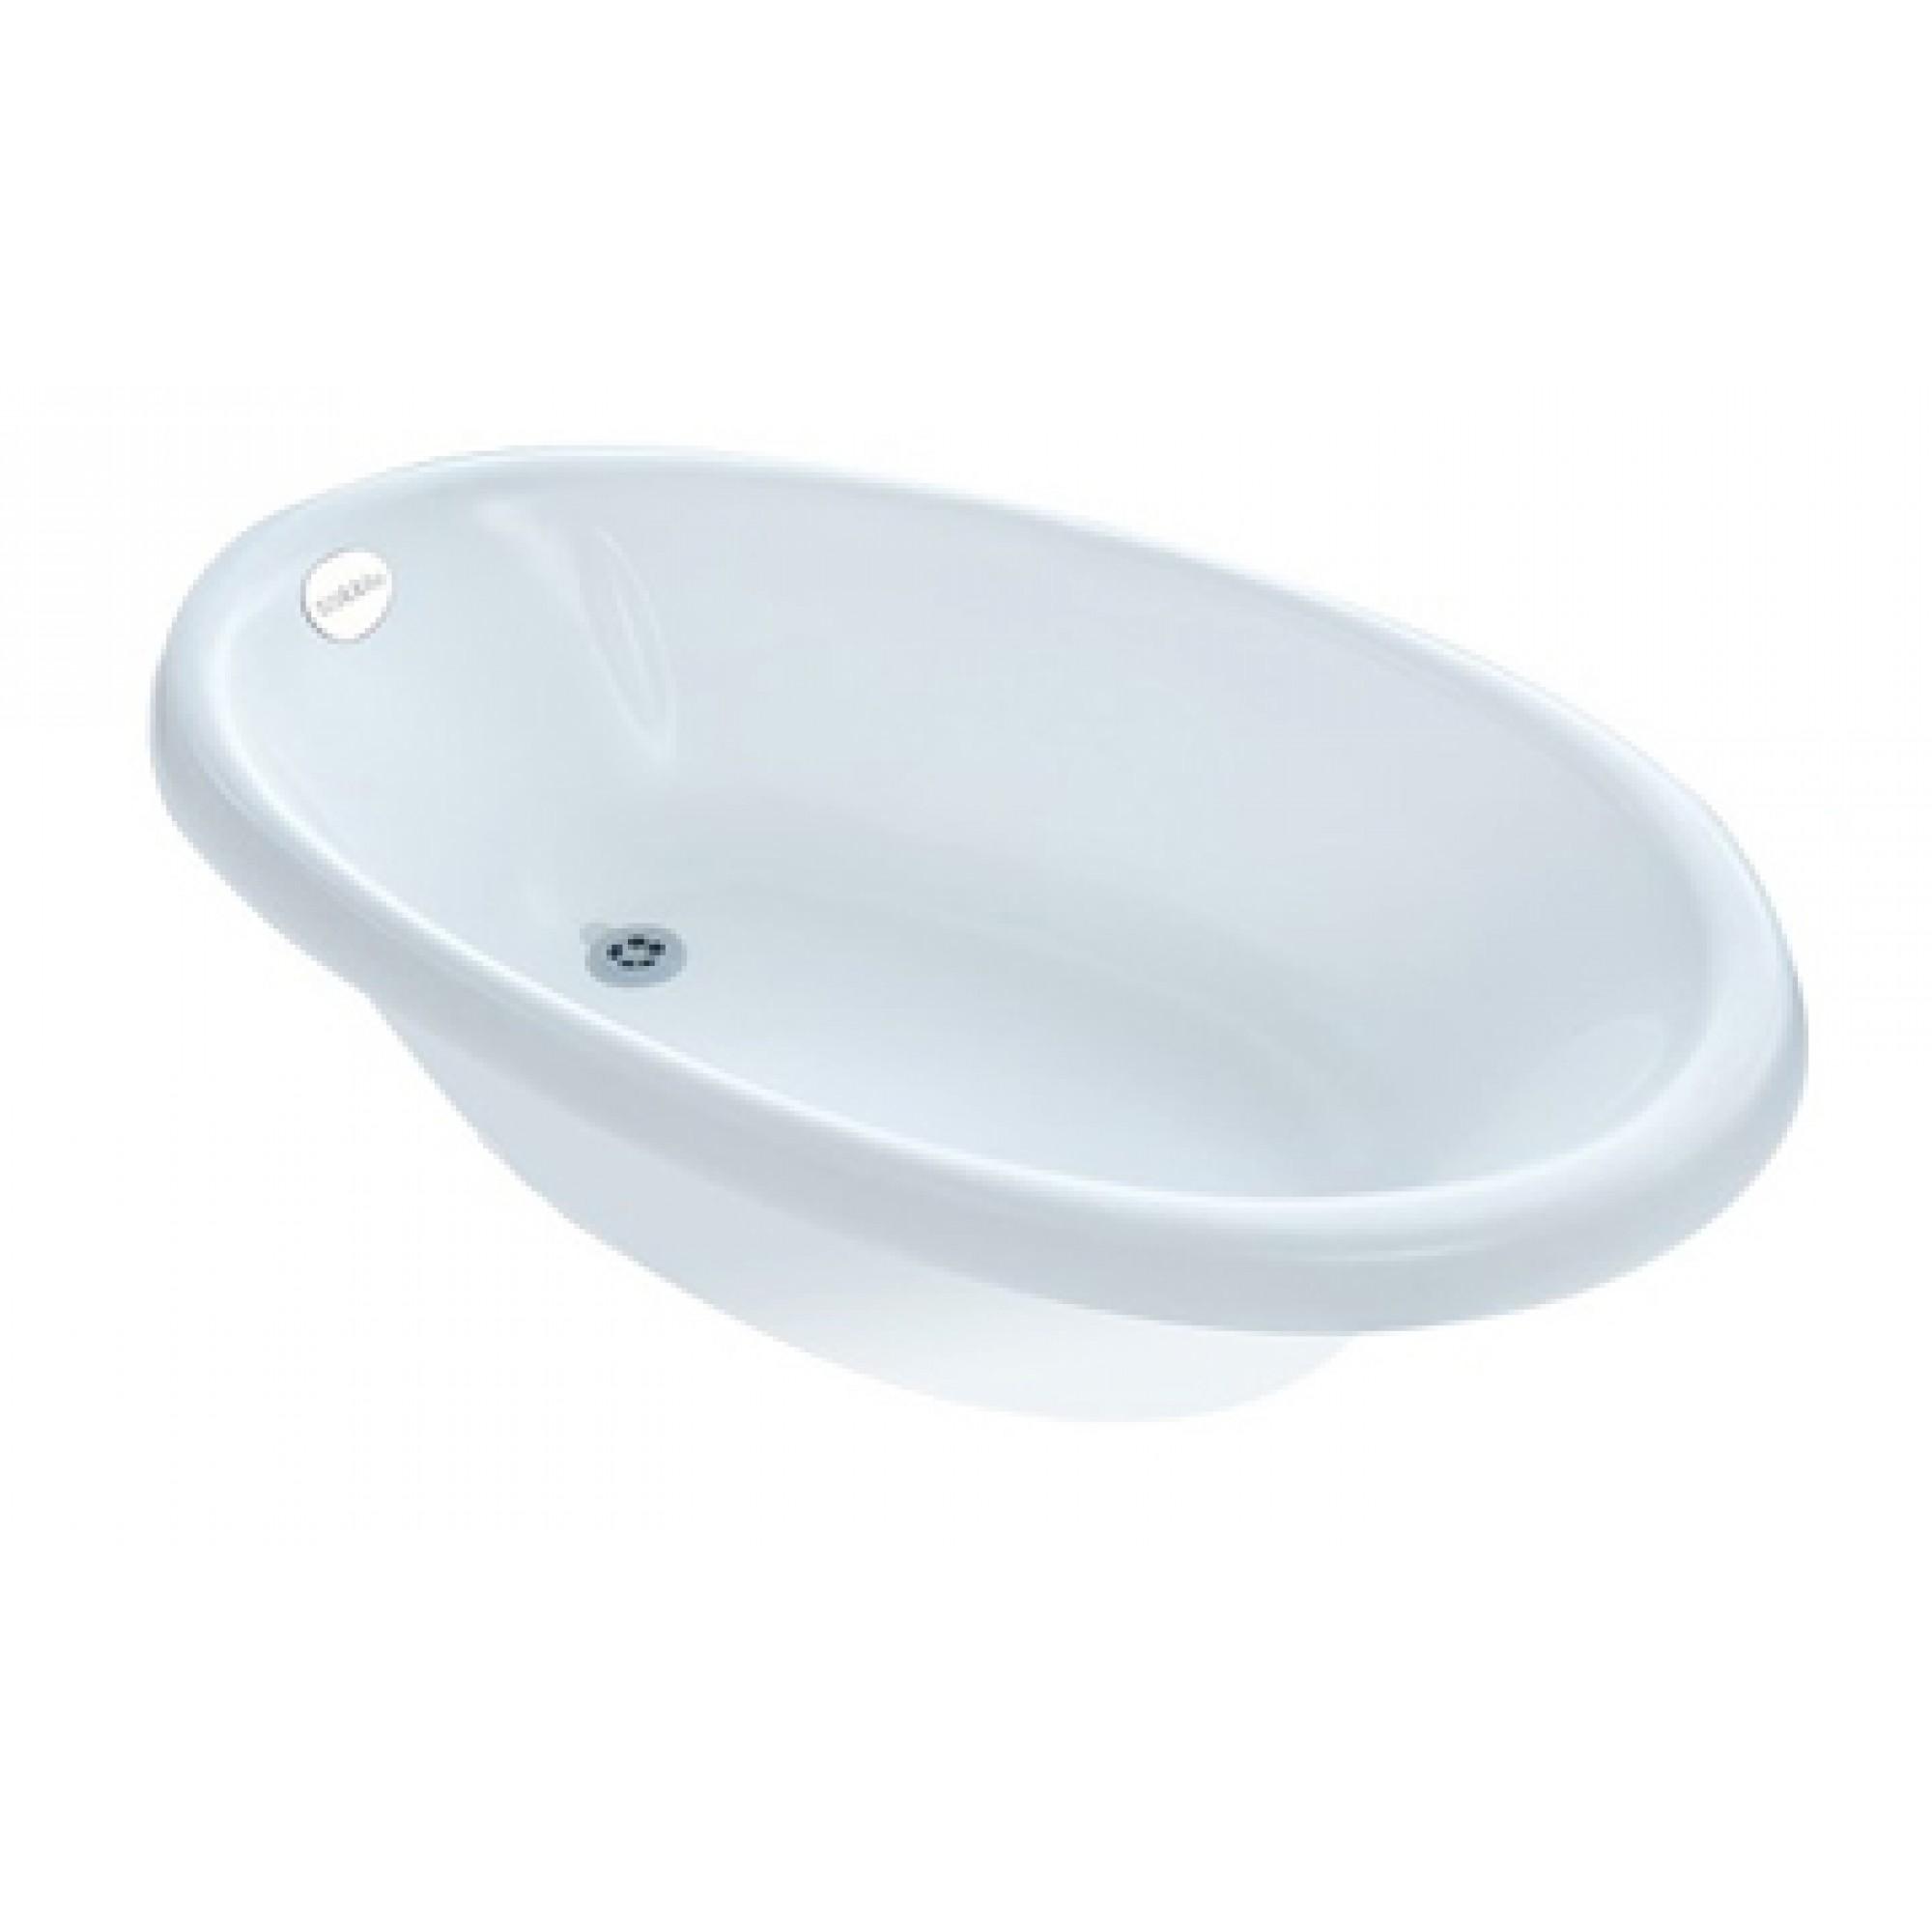 Cadita de baie venti, alb, sobble imagine